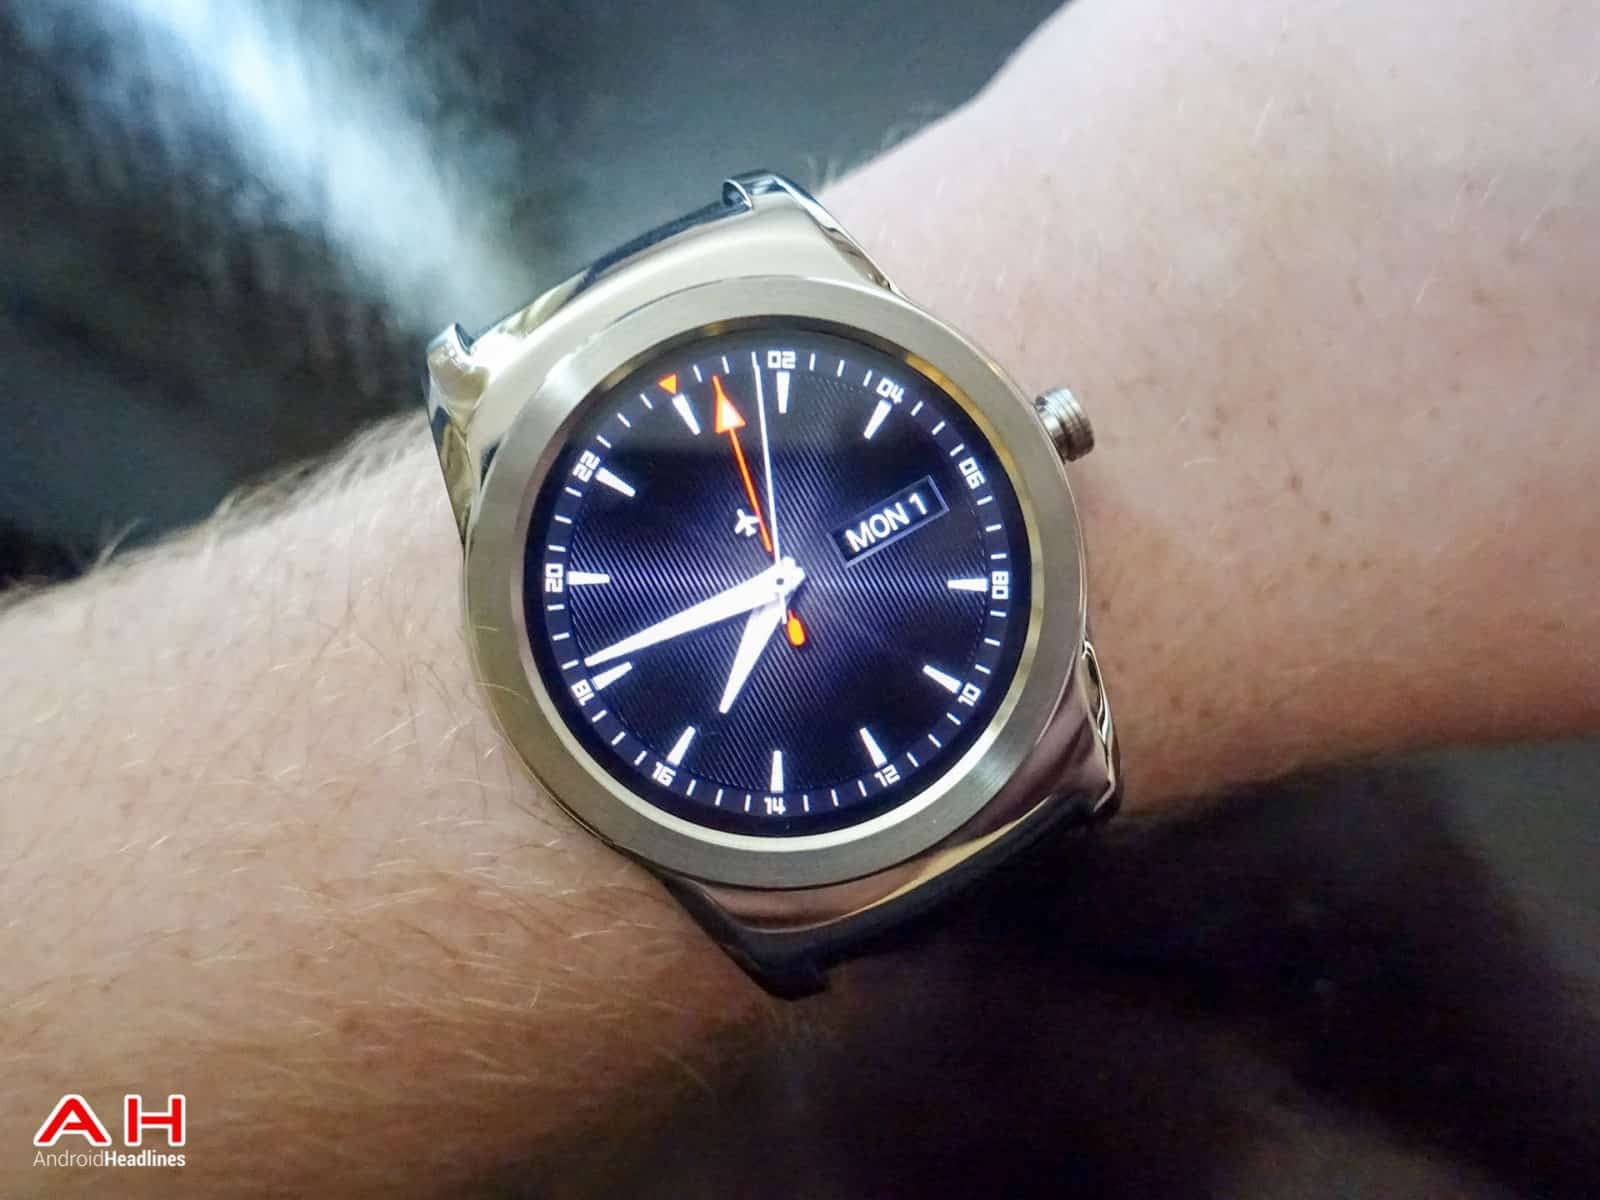 LG-Watch-Urbane-Review-AH-7